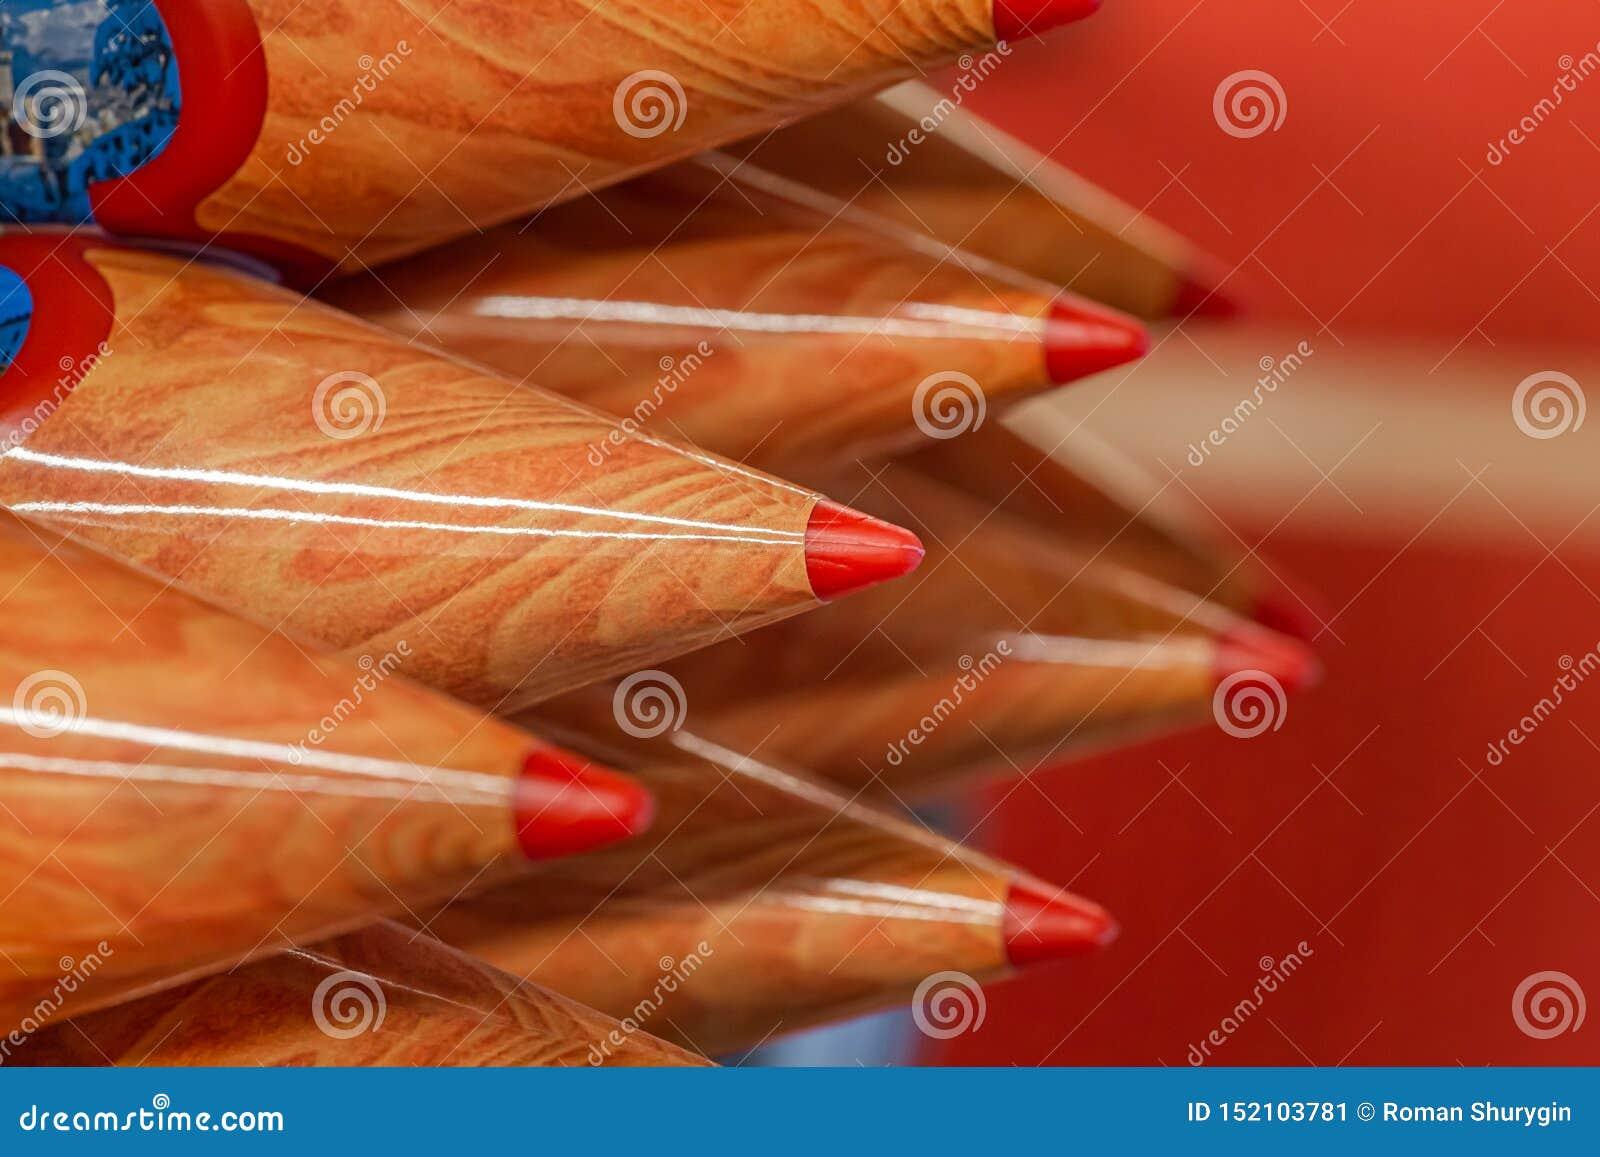 Lápices de madera coloreados, recuerdo